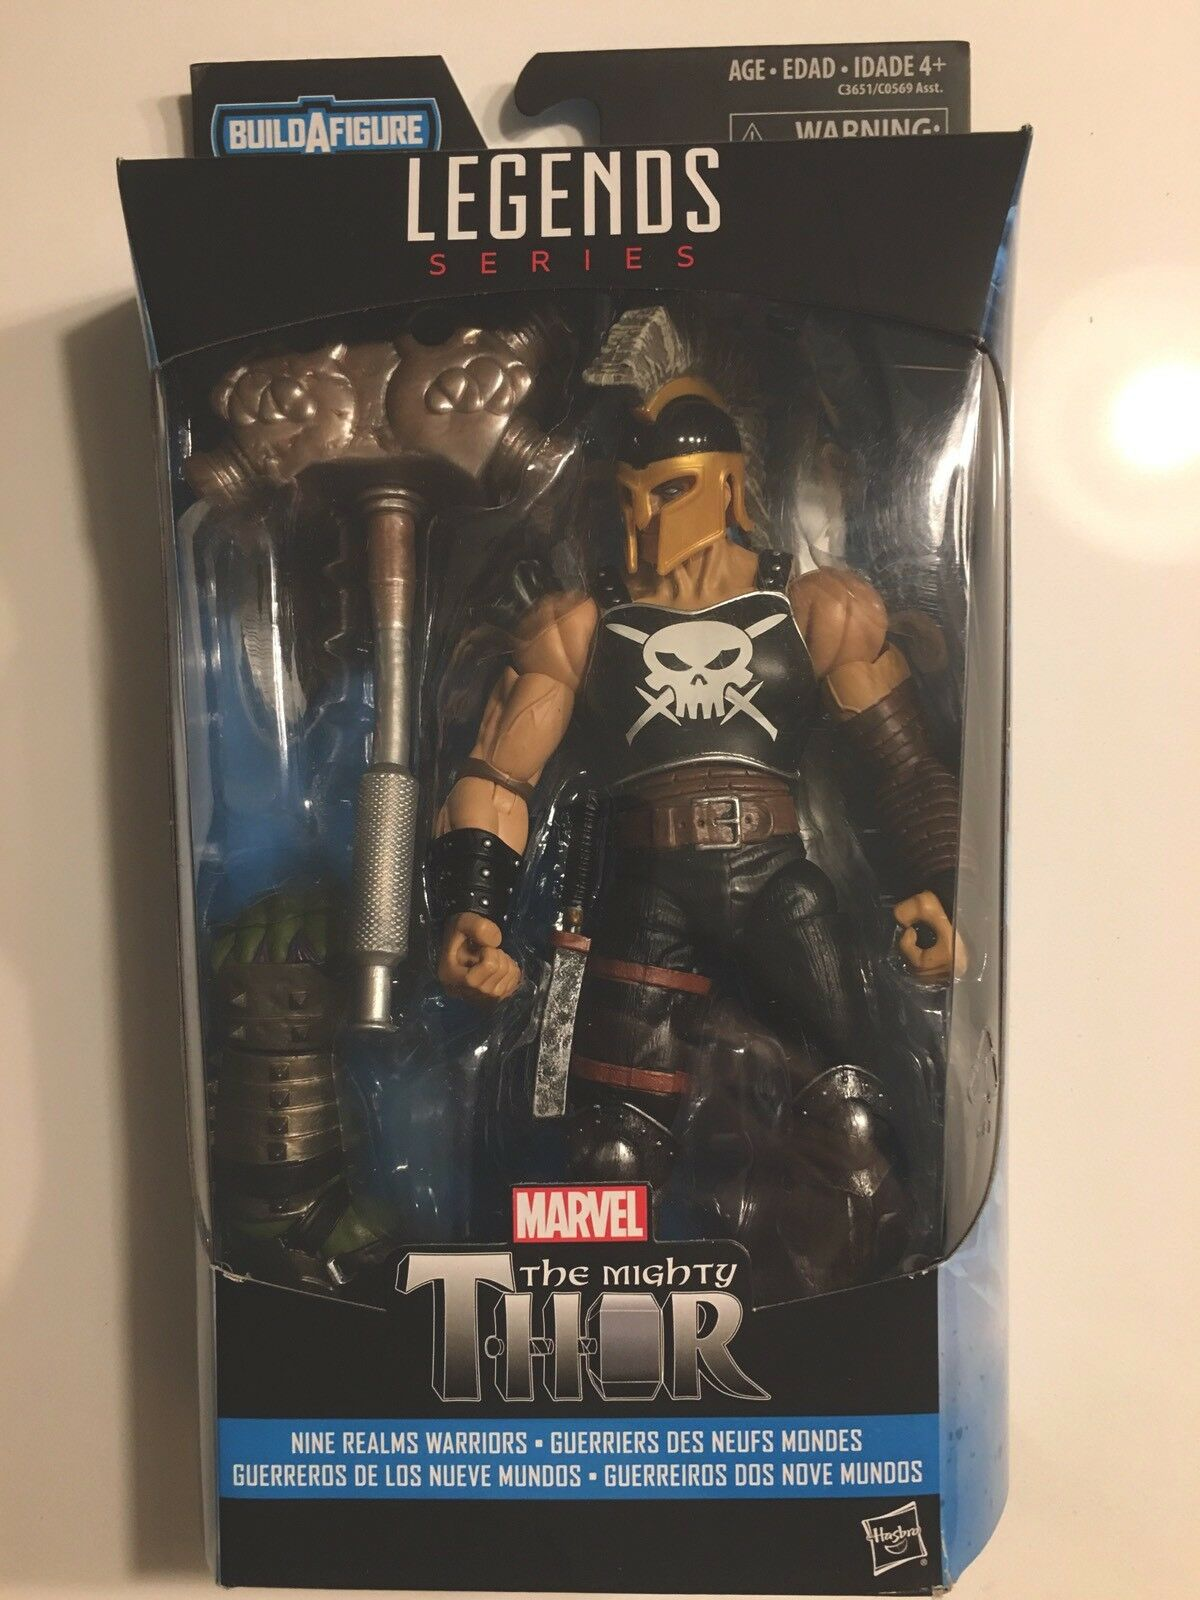 Marvel Legends ARES THOR Ragnarok HULK BAF Infinity War Deadpool Xessi Lot nuovo